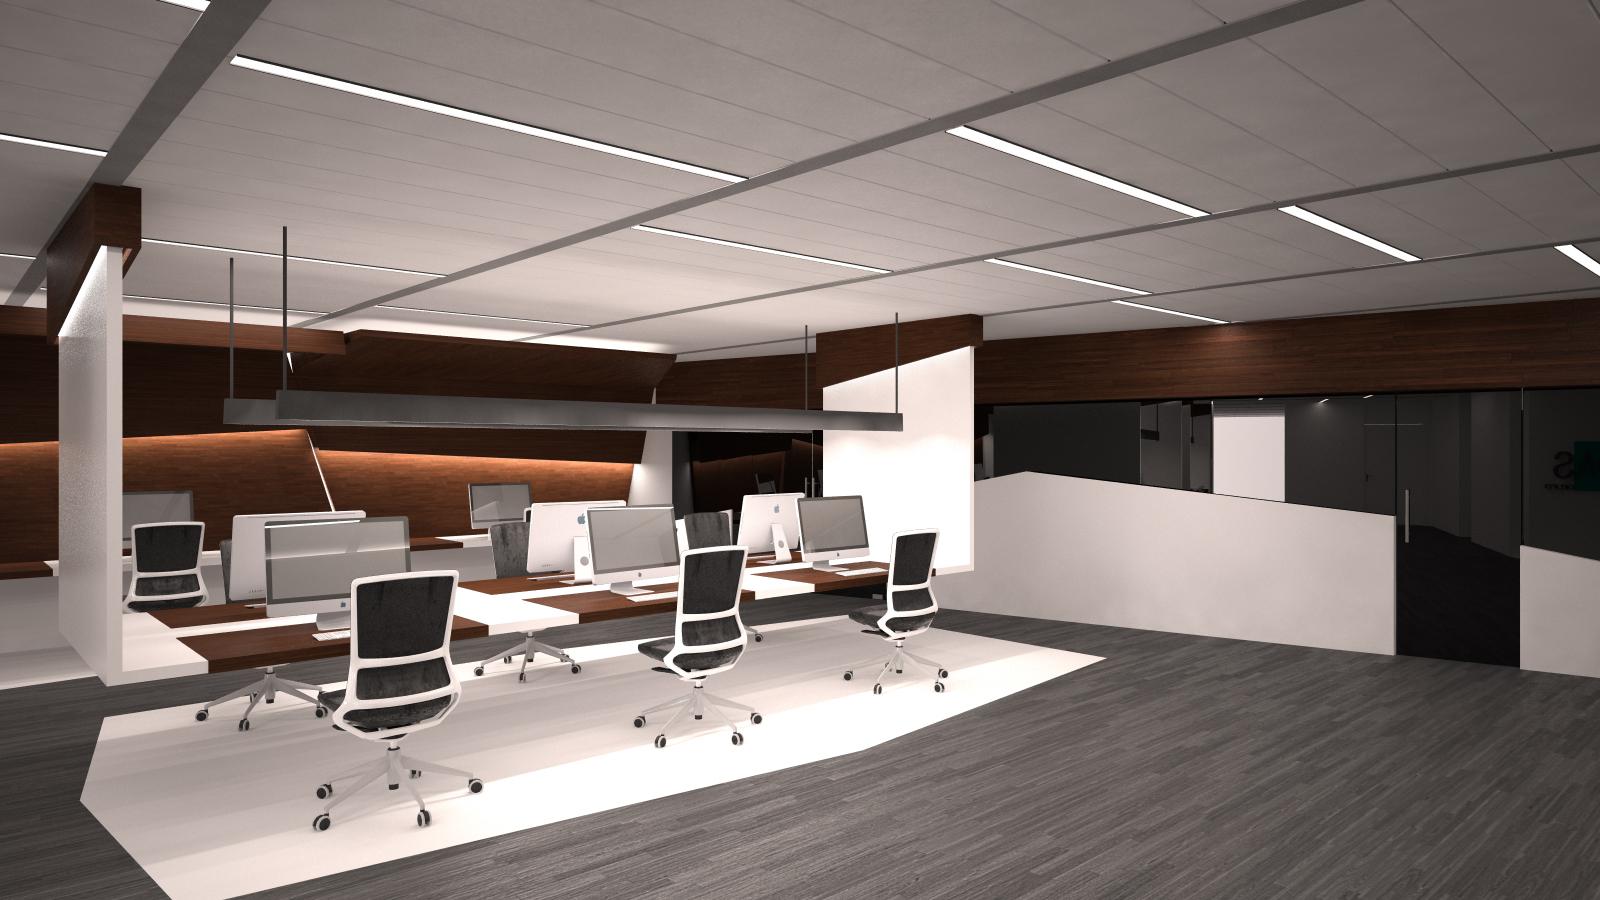 Dise o de oficinas en madrid grupoias for Oficinas envialia madrid